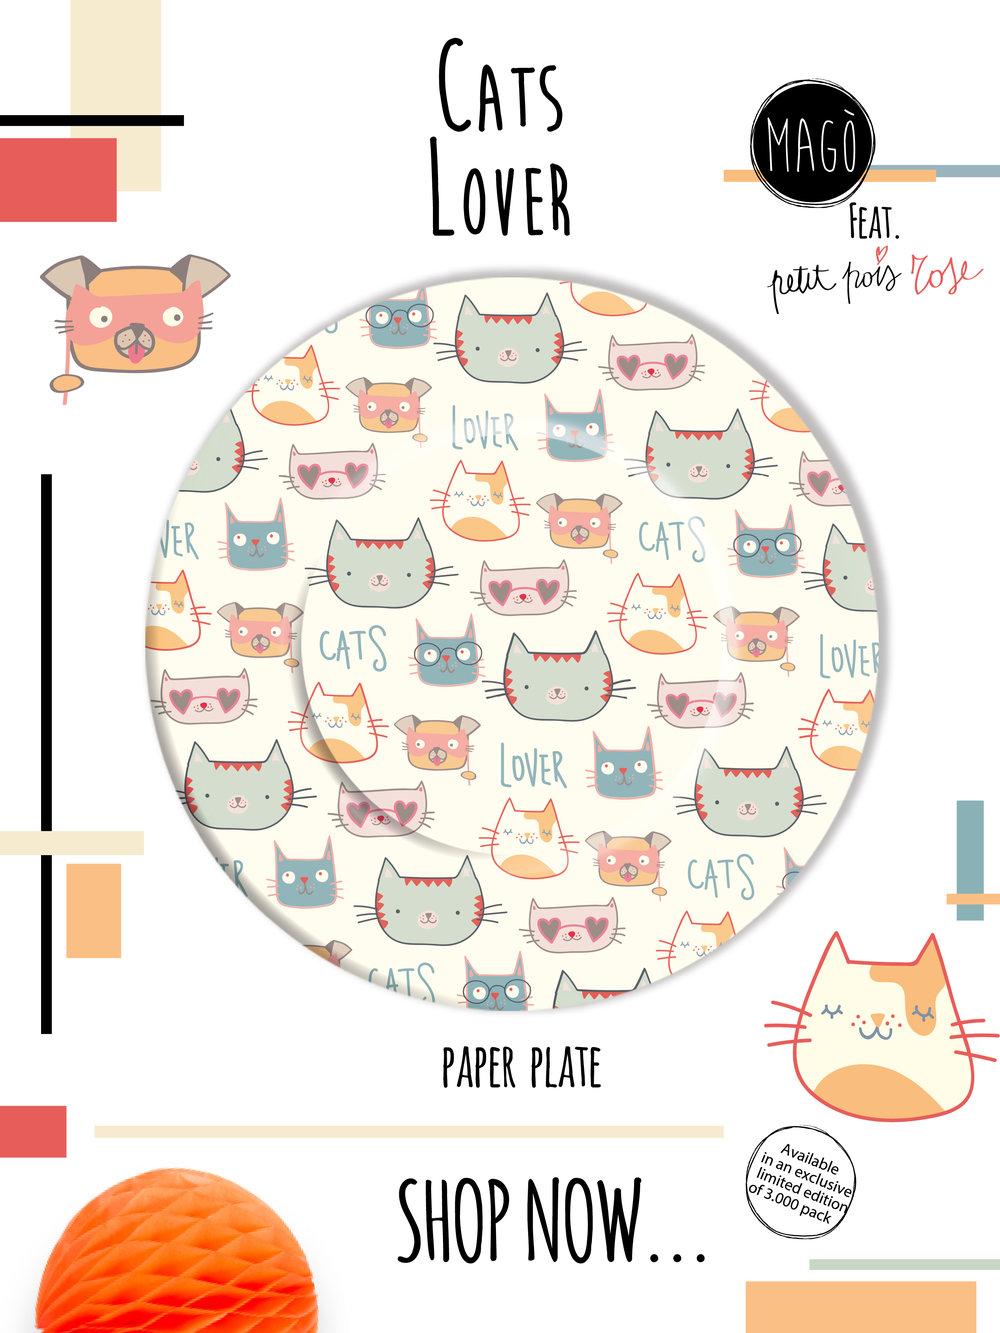 Magò-Party-Festa-Cat-Lover.jpg